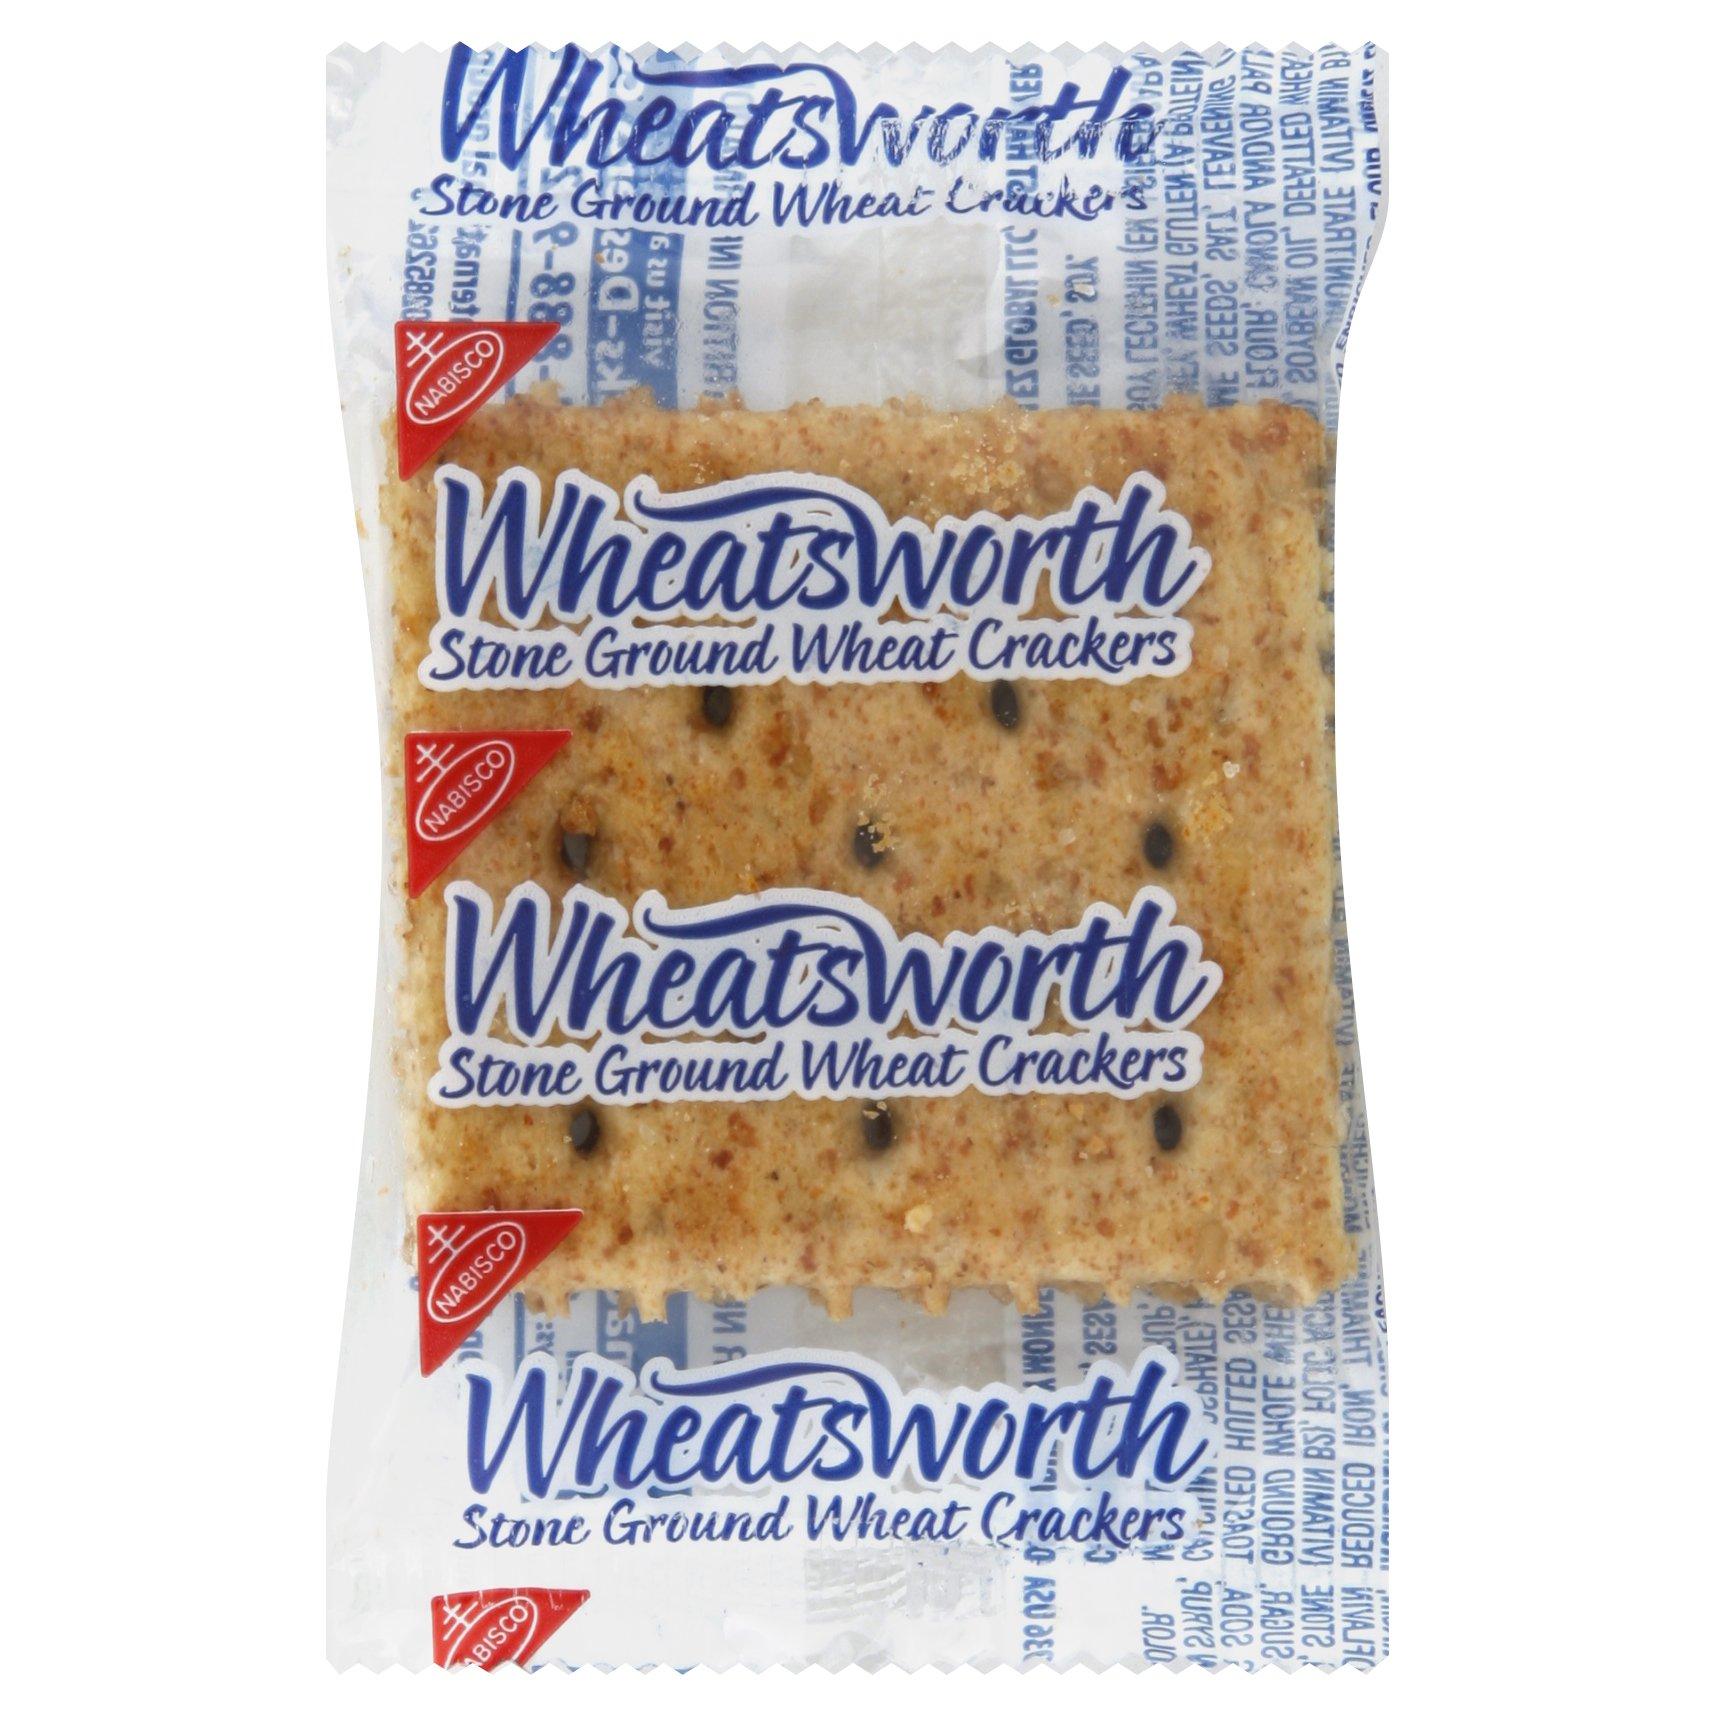 Nabisco Wheatsworth Stone Ground Wheat Crackers, 0.2 Ounce (Pack of 500)